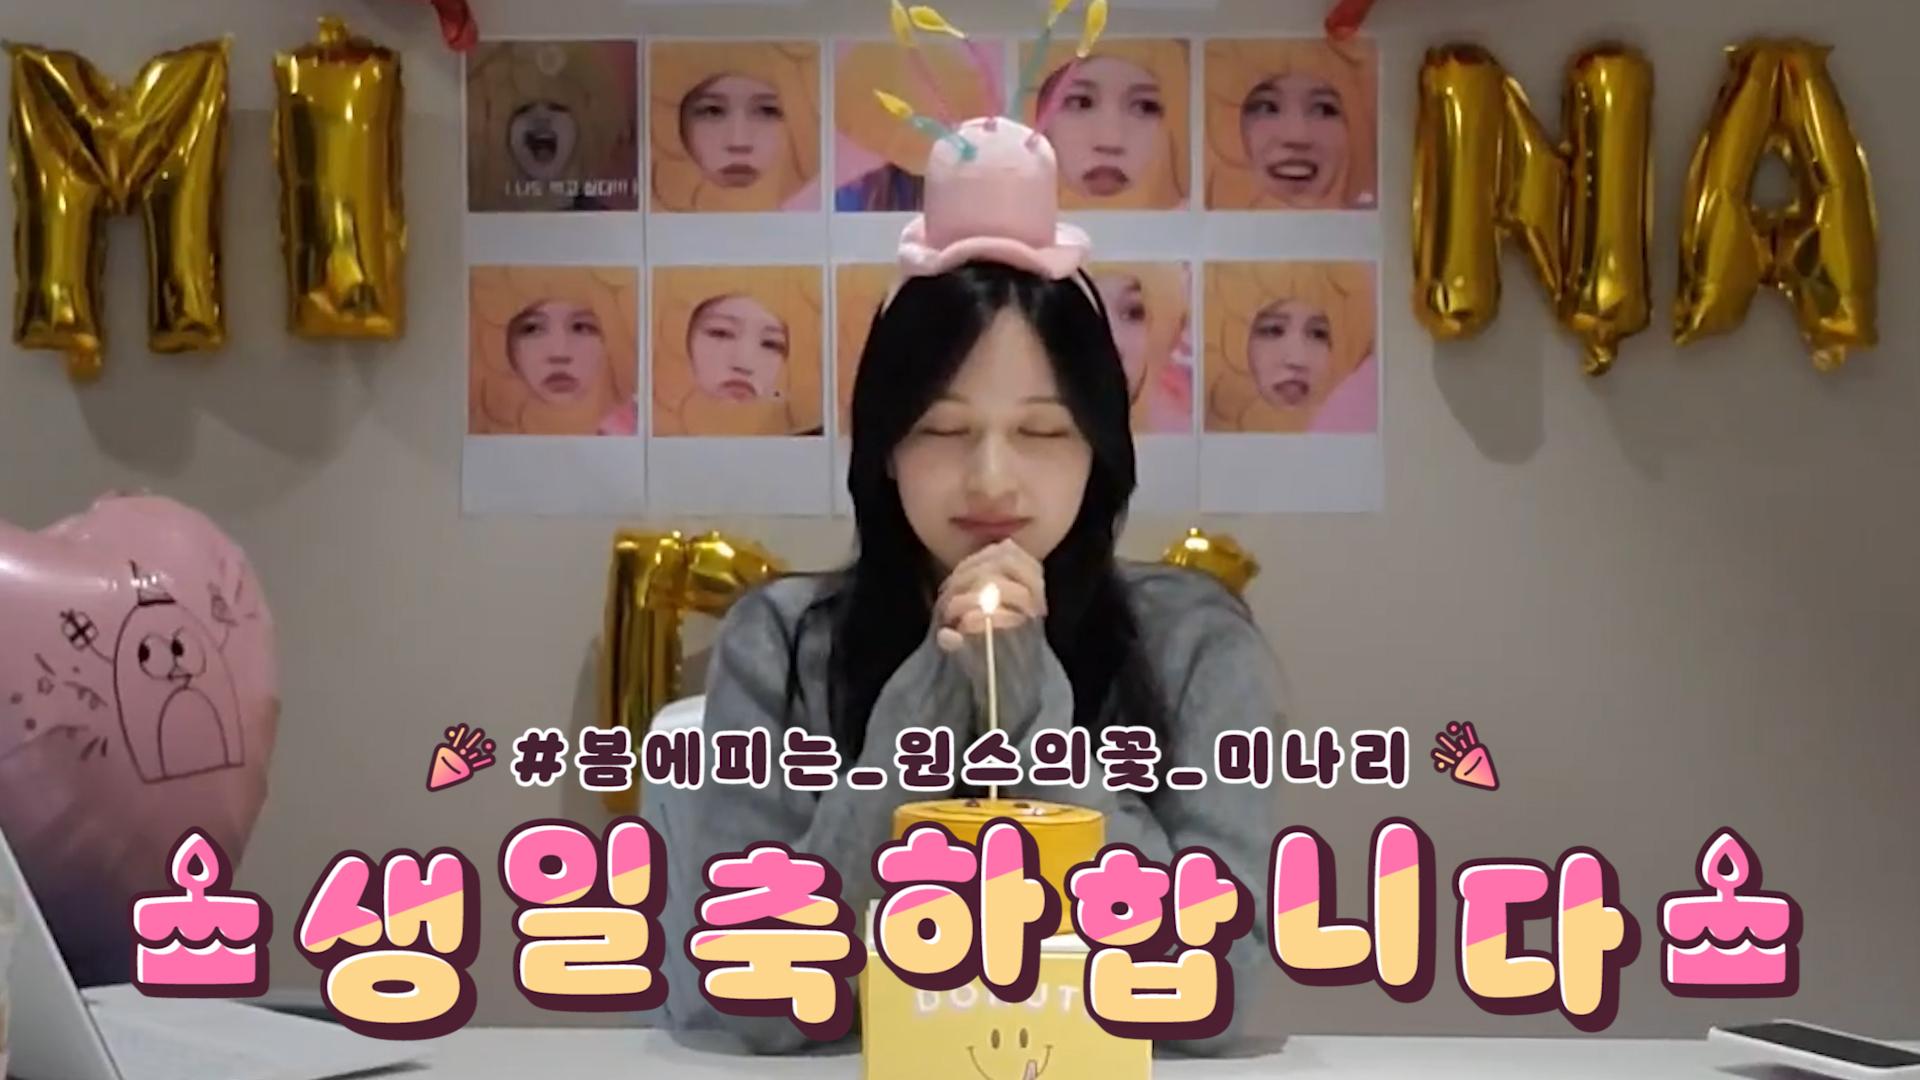 [TWICE] 🌸봄날의 크리스마스🎄같은 해피 미나 데이🐧(HAPPY MINA DAY!)